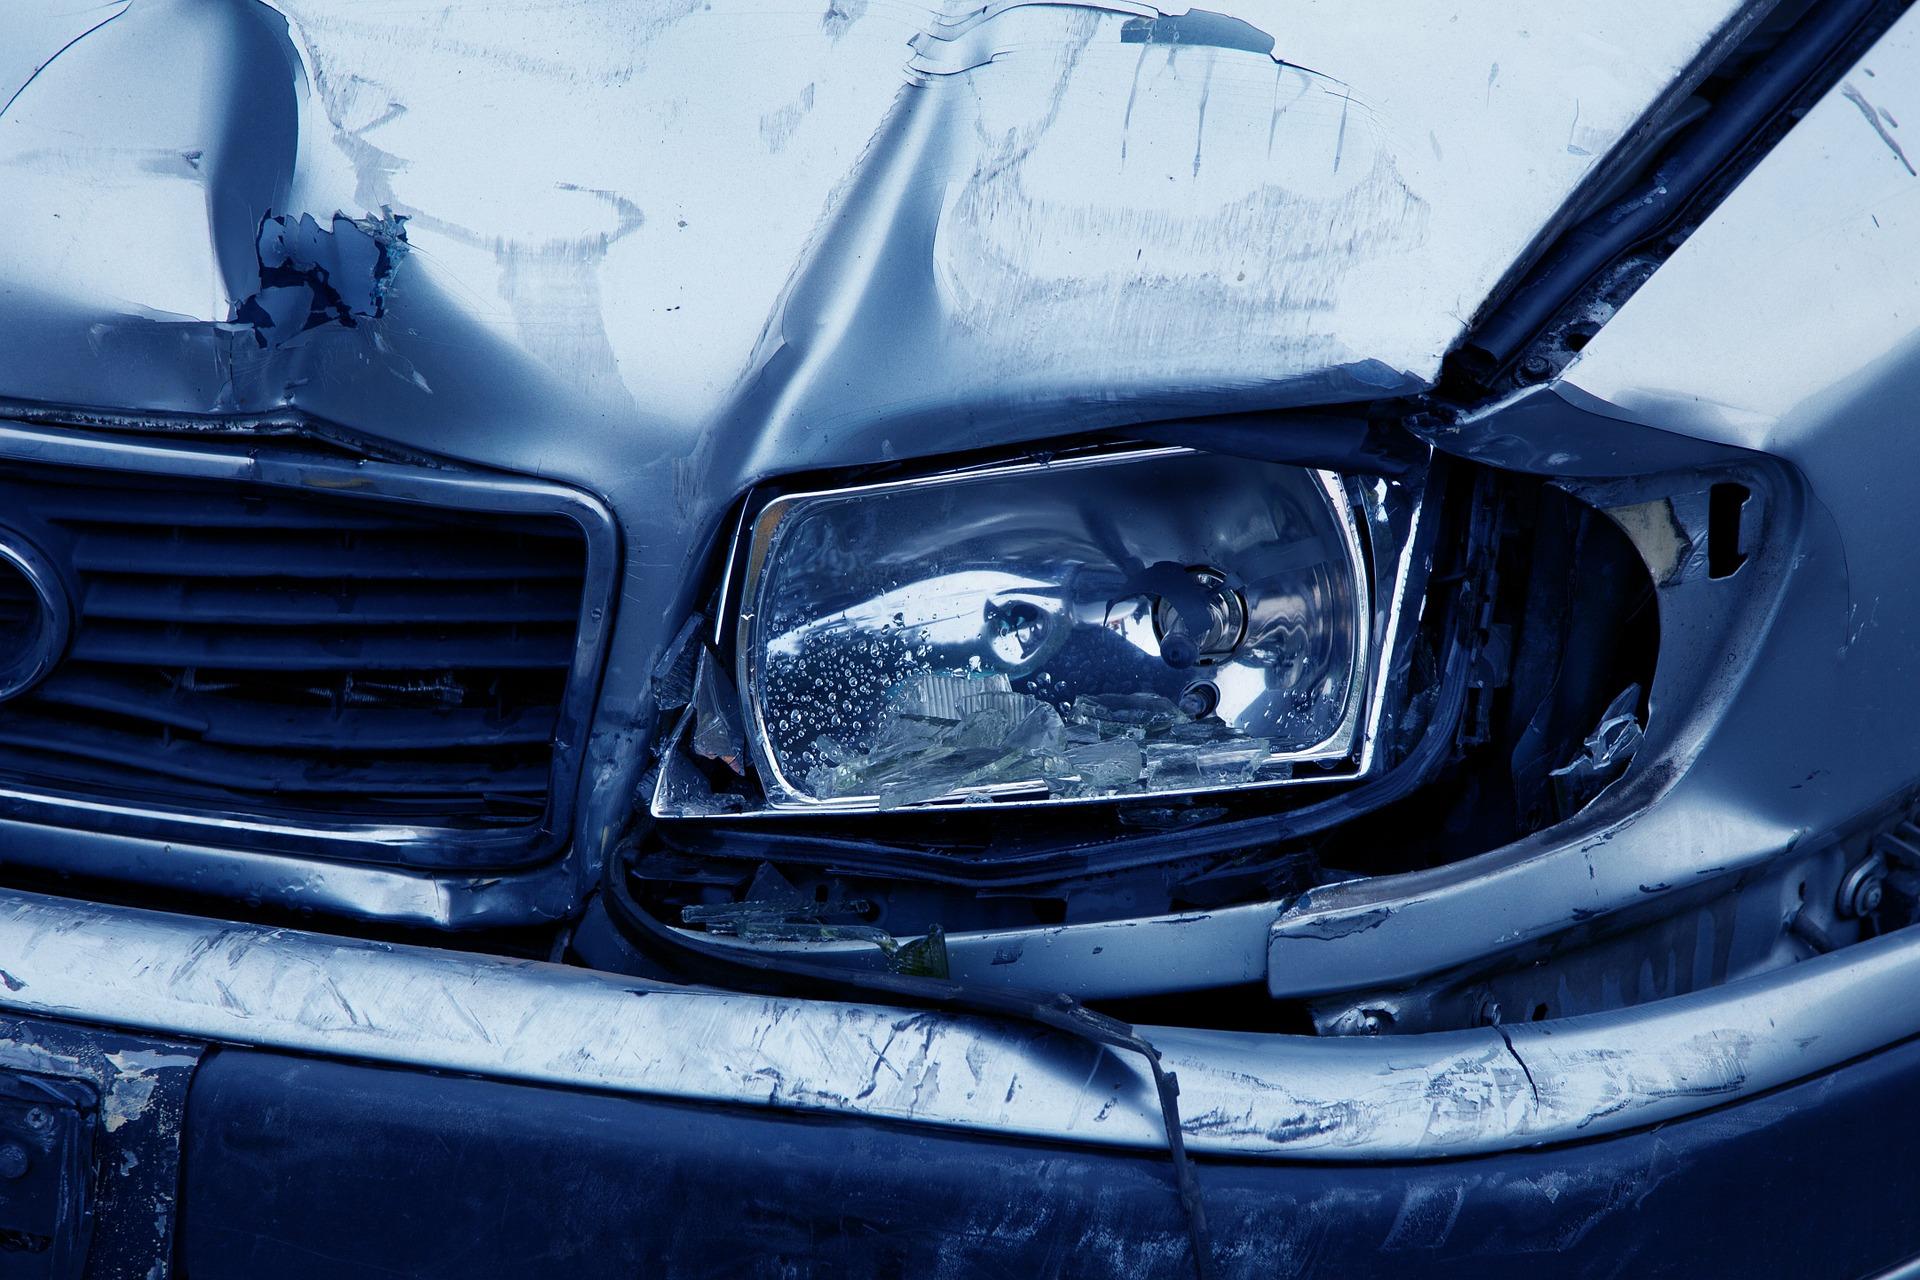 Scrapping a car Near Winthrop MA